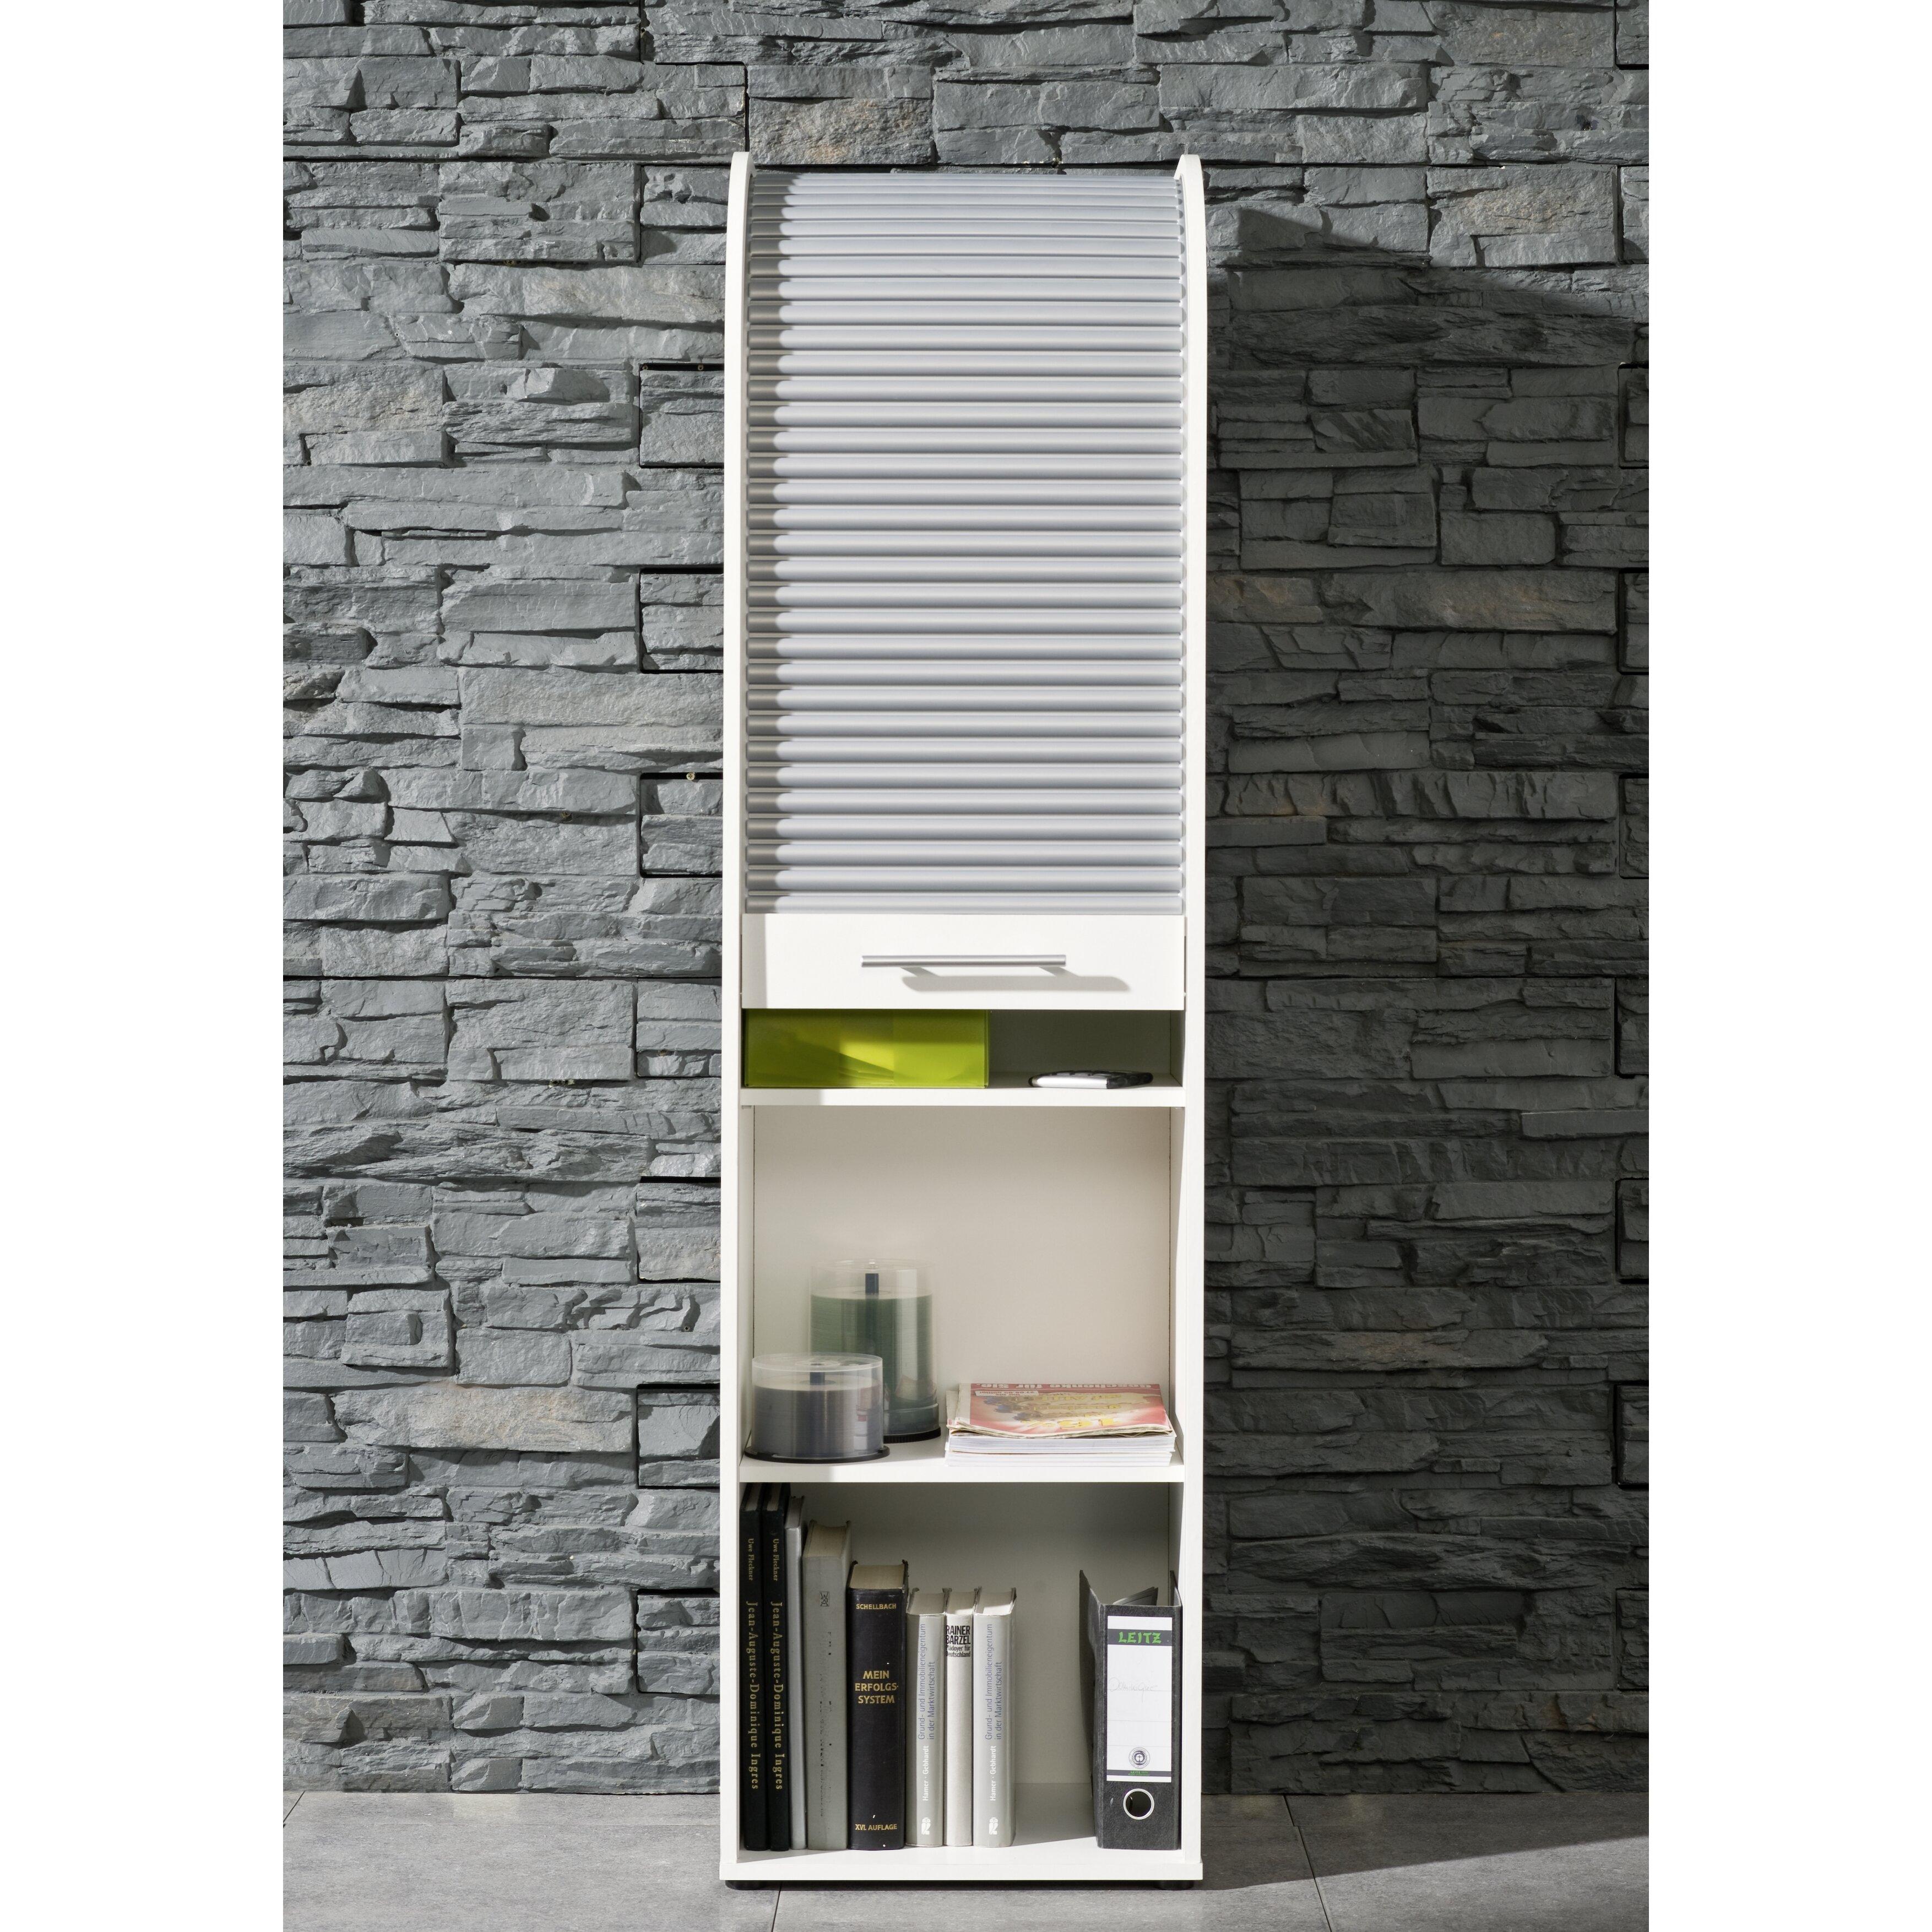 caracella aufbewahrungsschrank rollo reviews von caracella. Black Bedroom Furniture Sets. Home Design Ideas